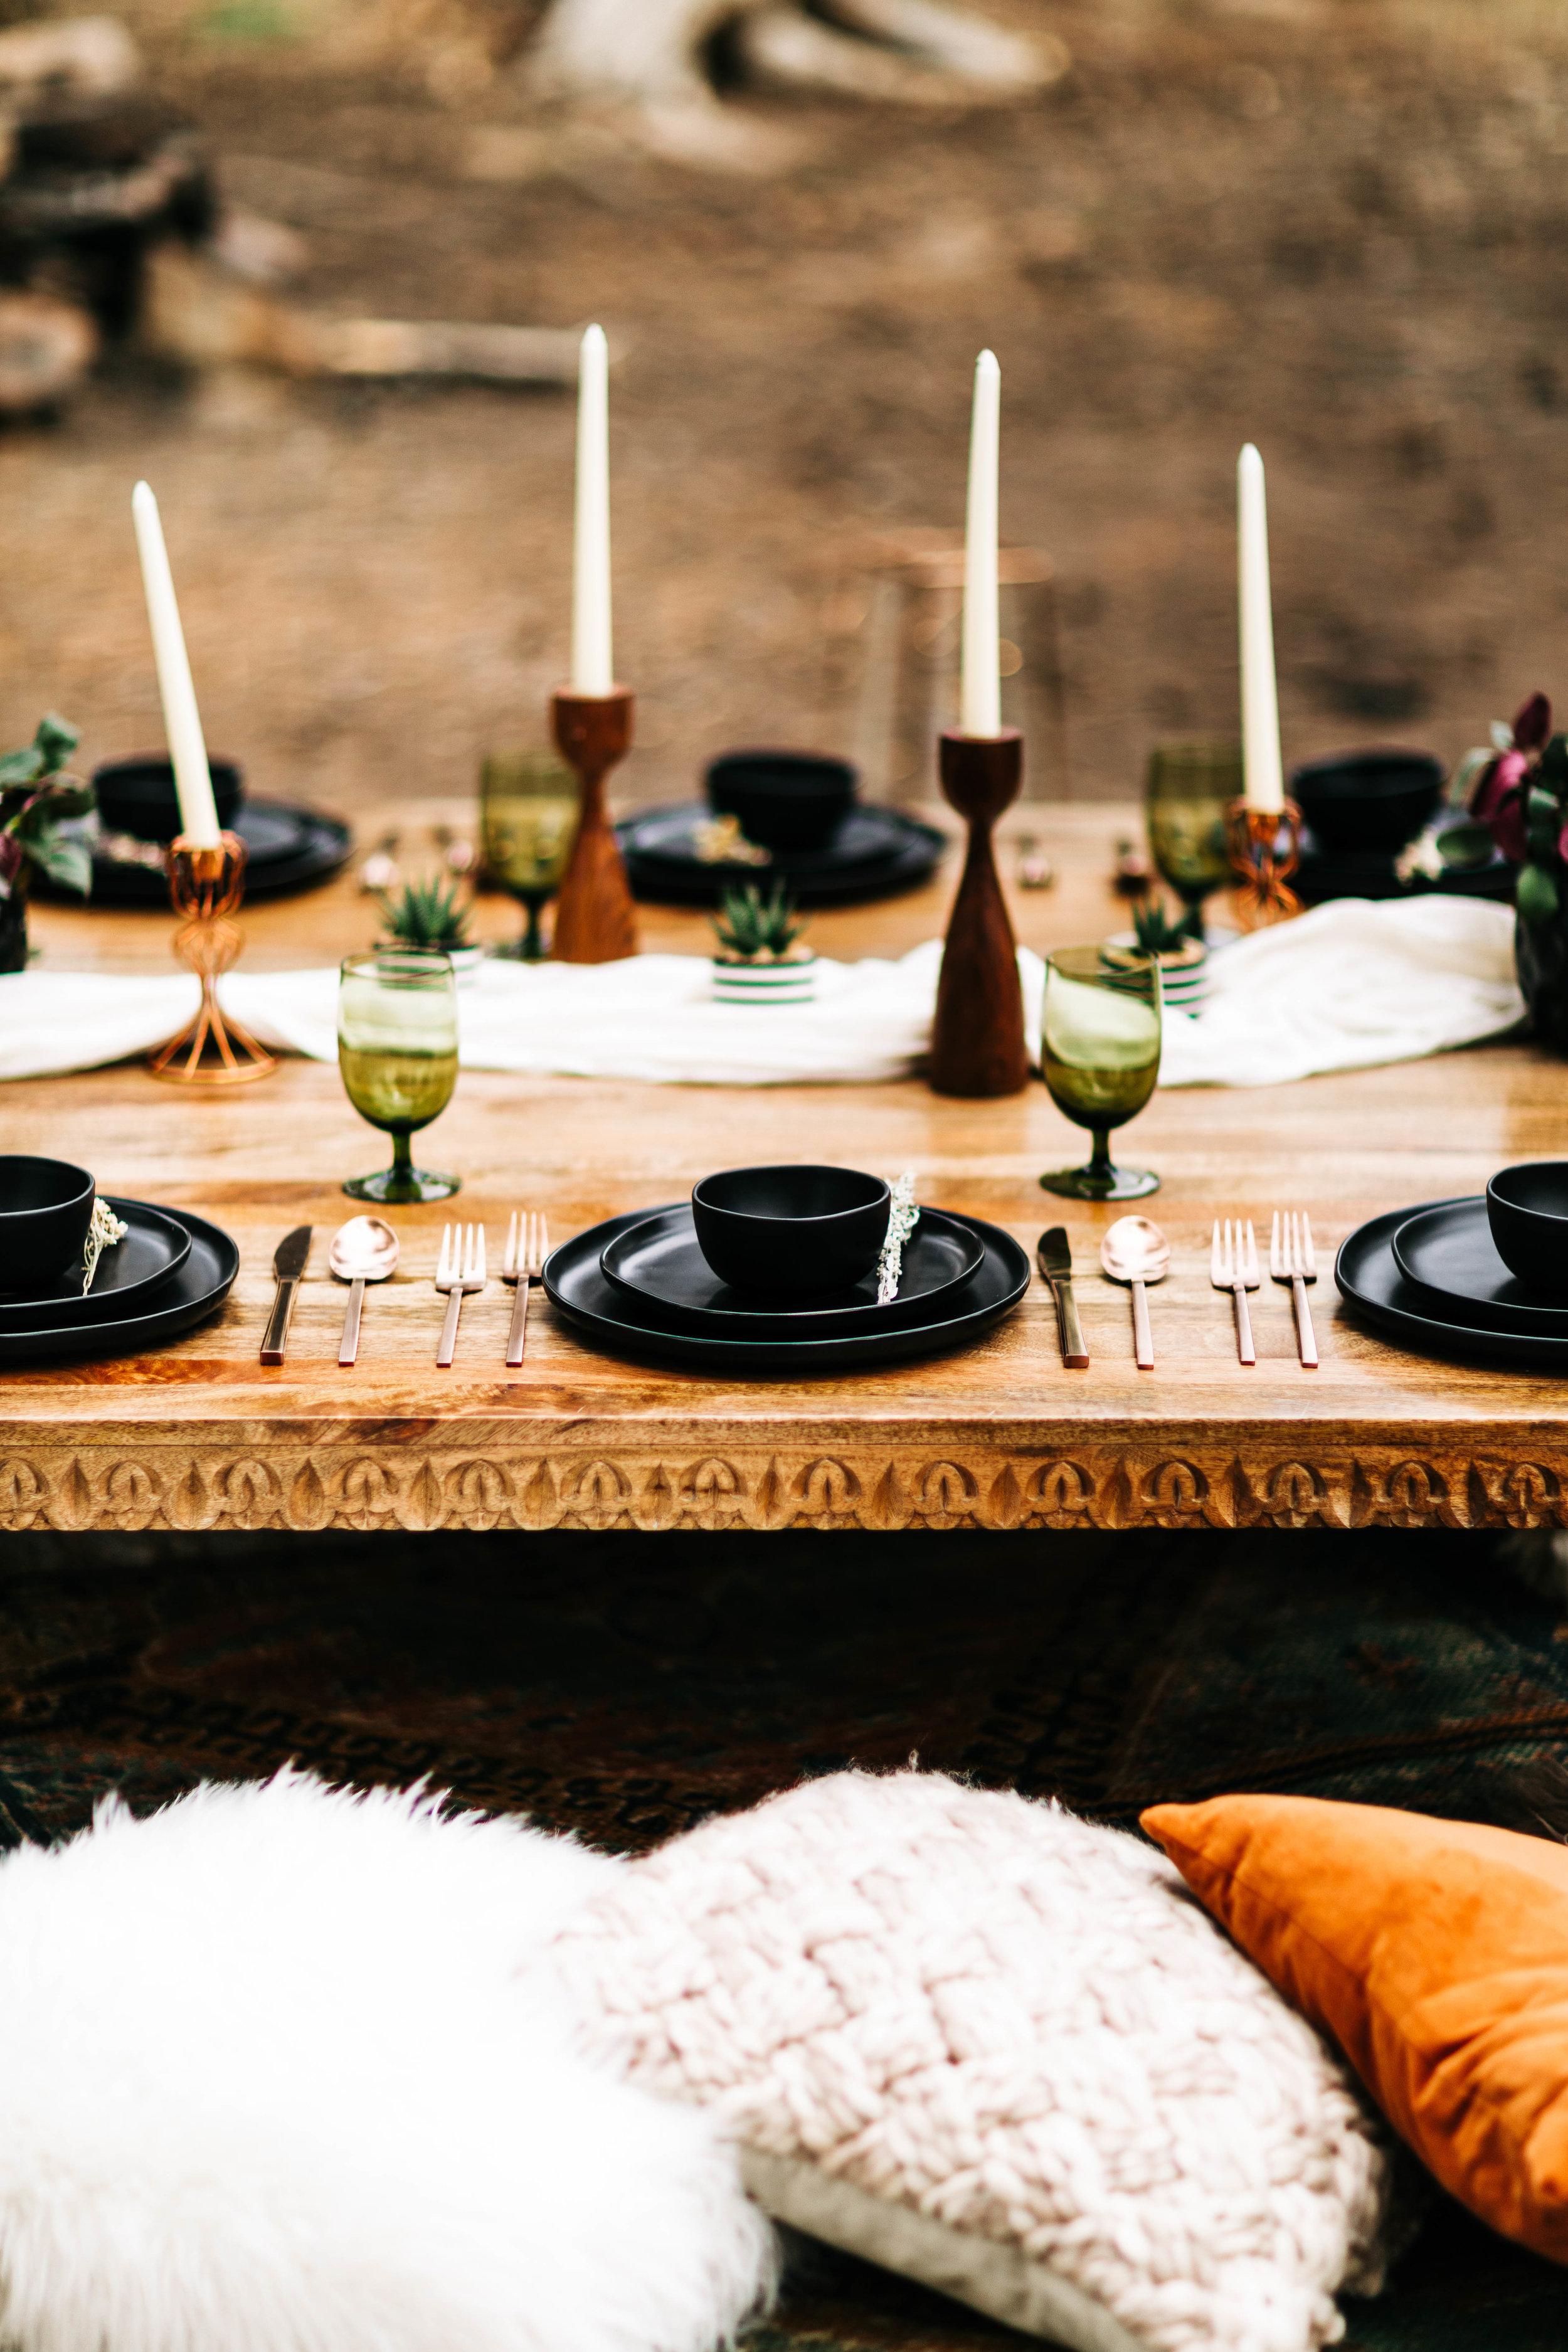 Morocco inspired adventure elopement dinner | Rocky Mountain elopement ideas